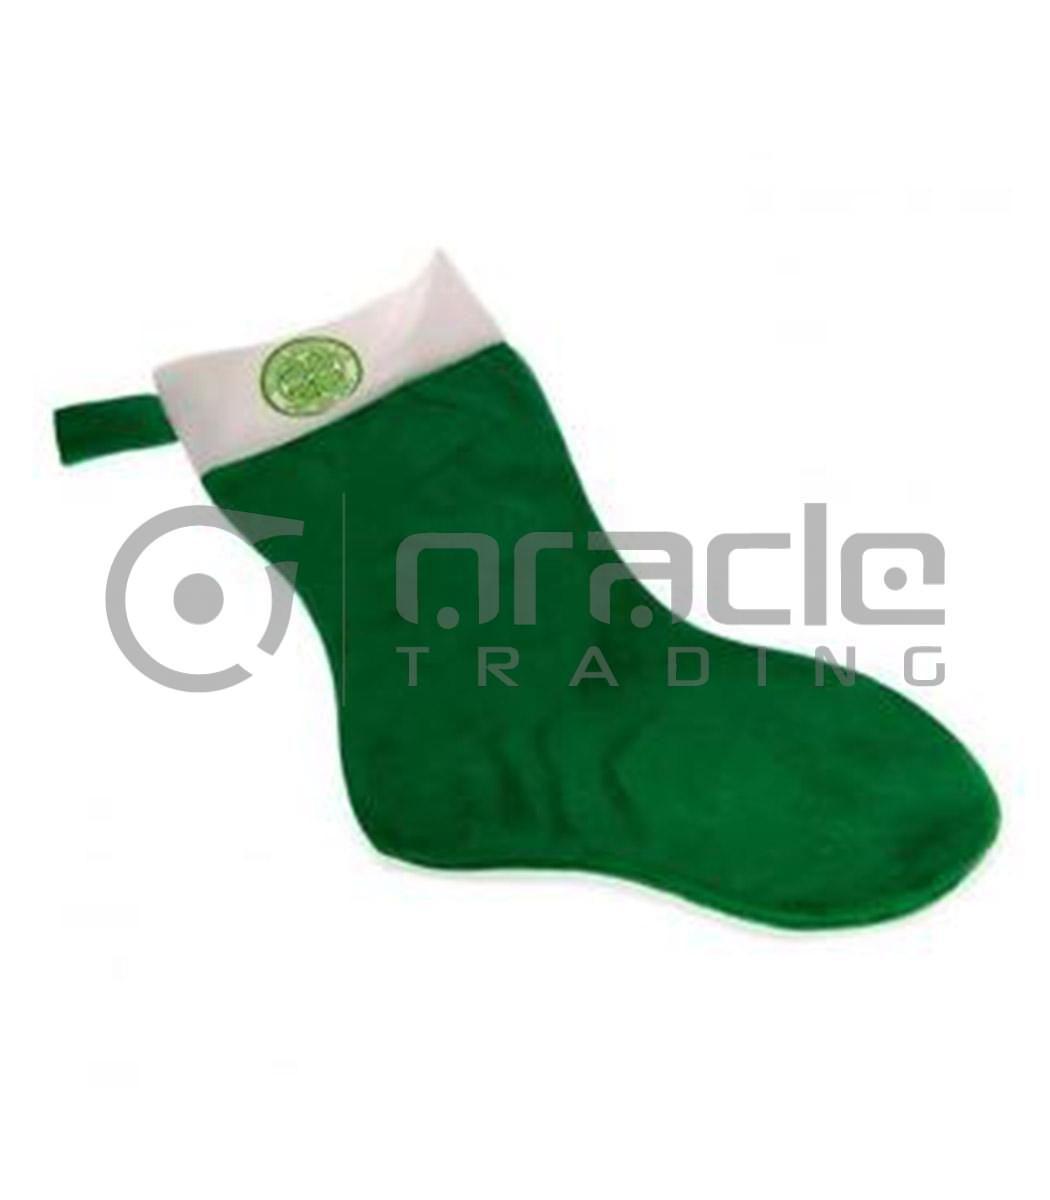 Celtic Christmas Stocking